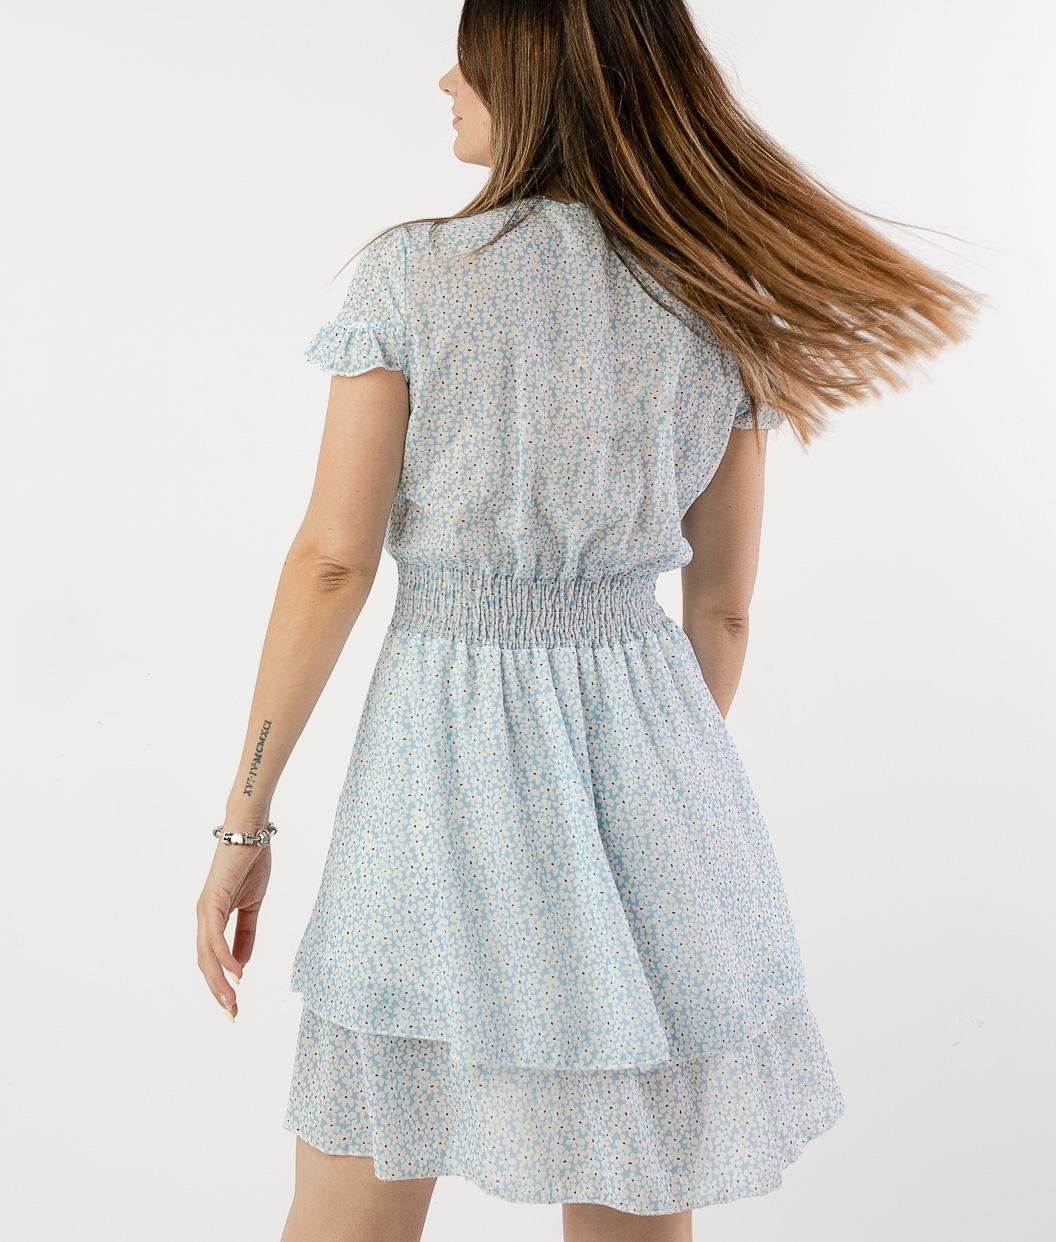 SEPERE DRESS - BLUE